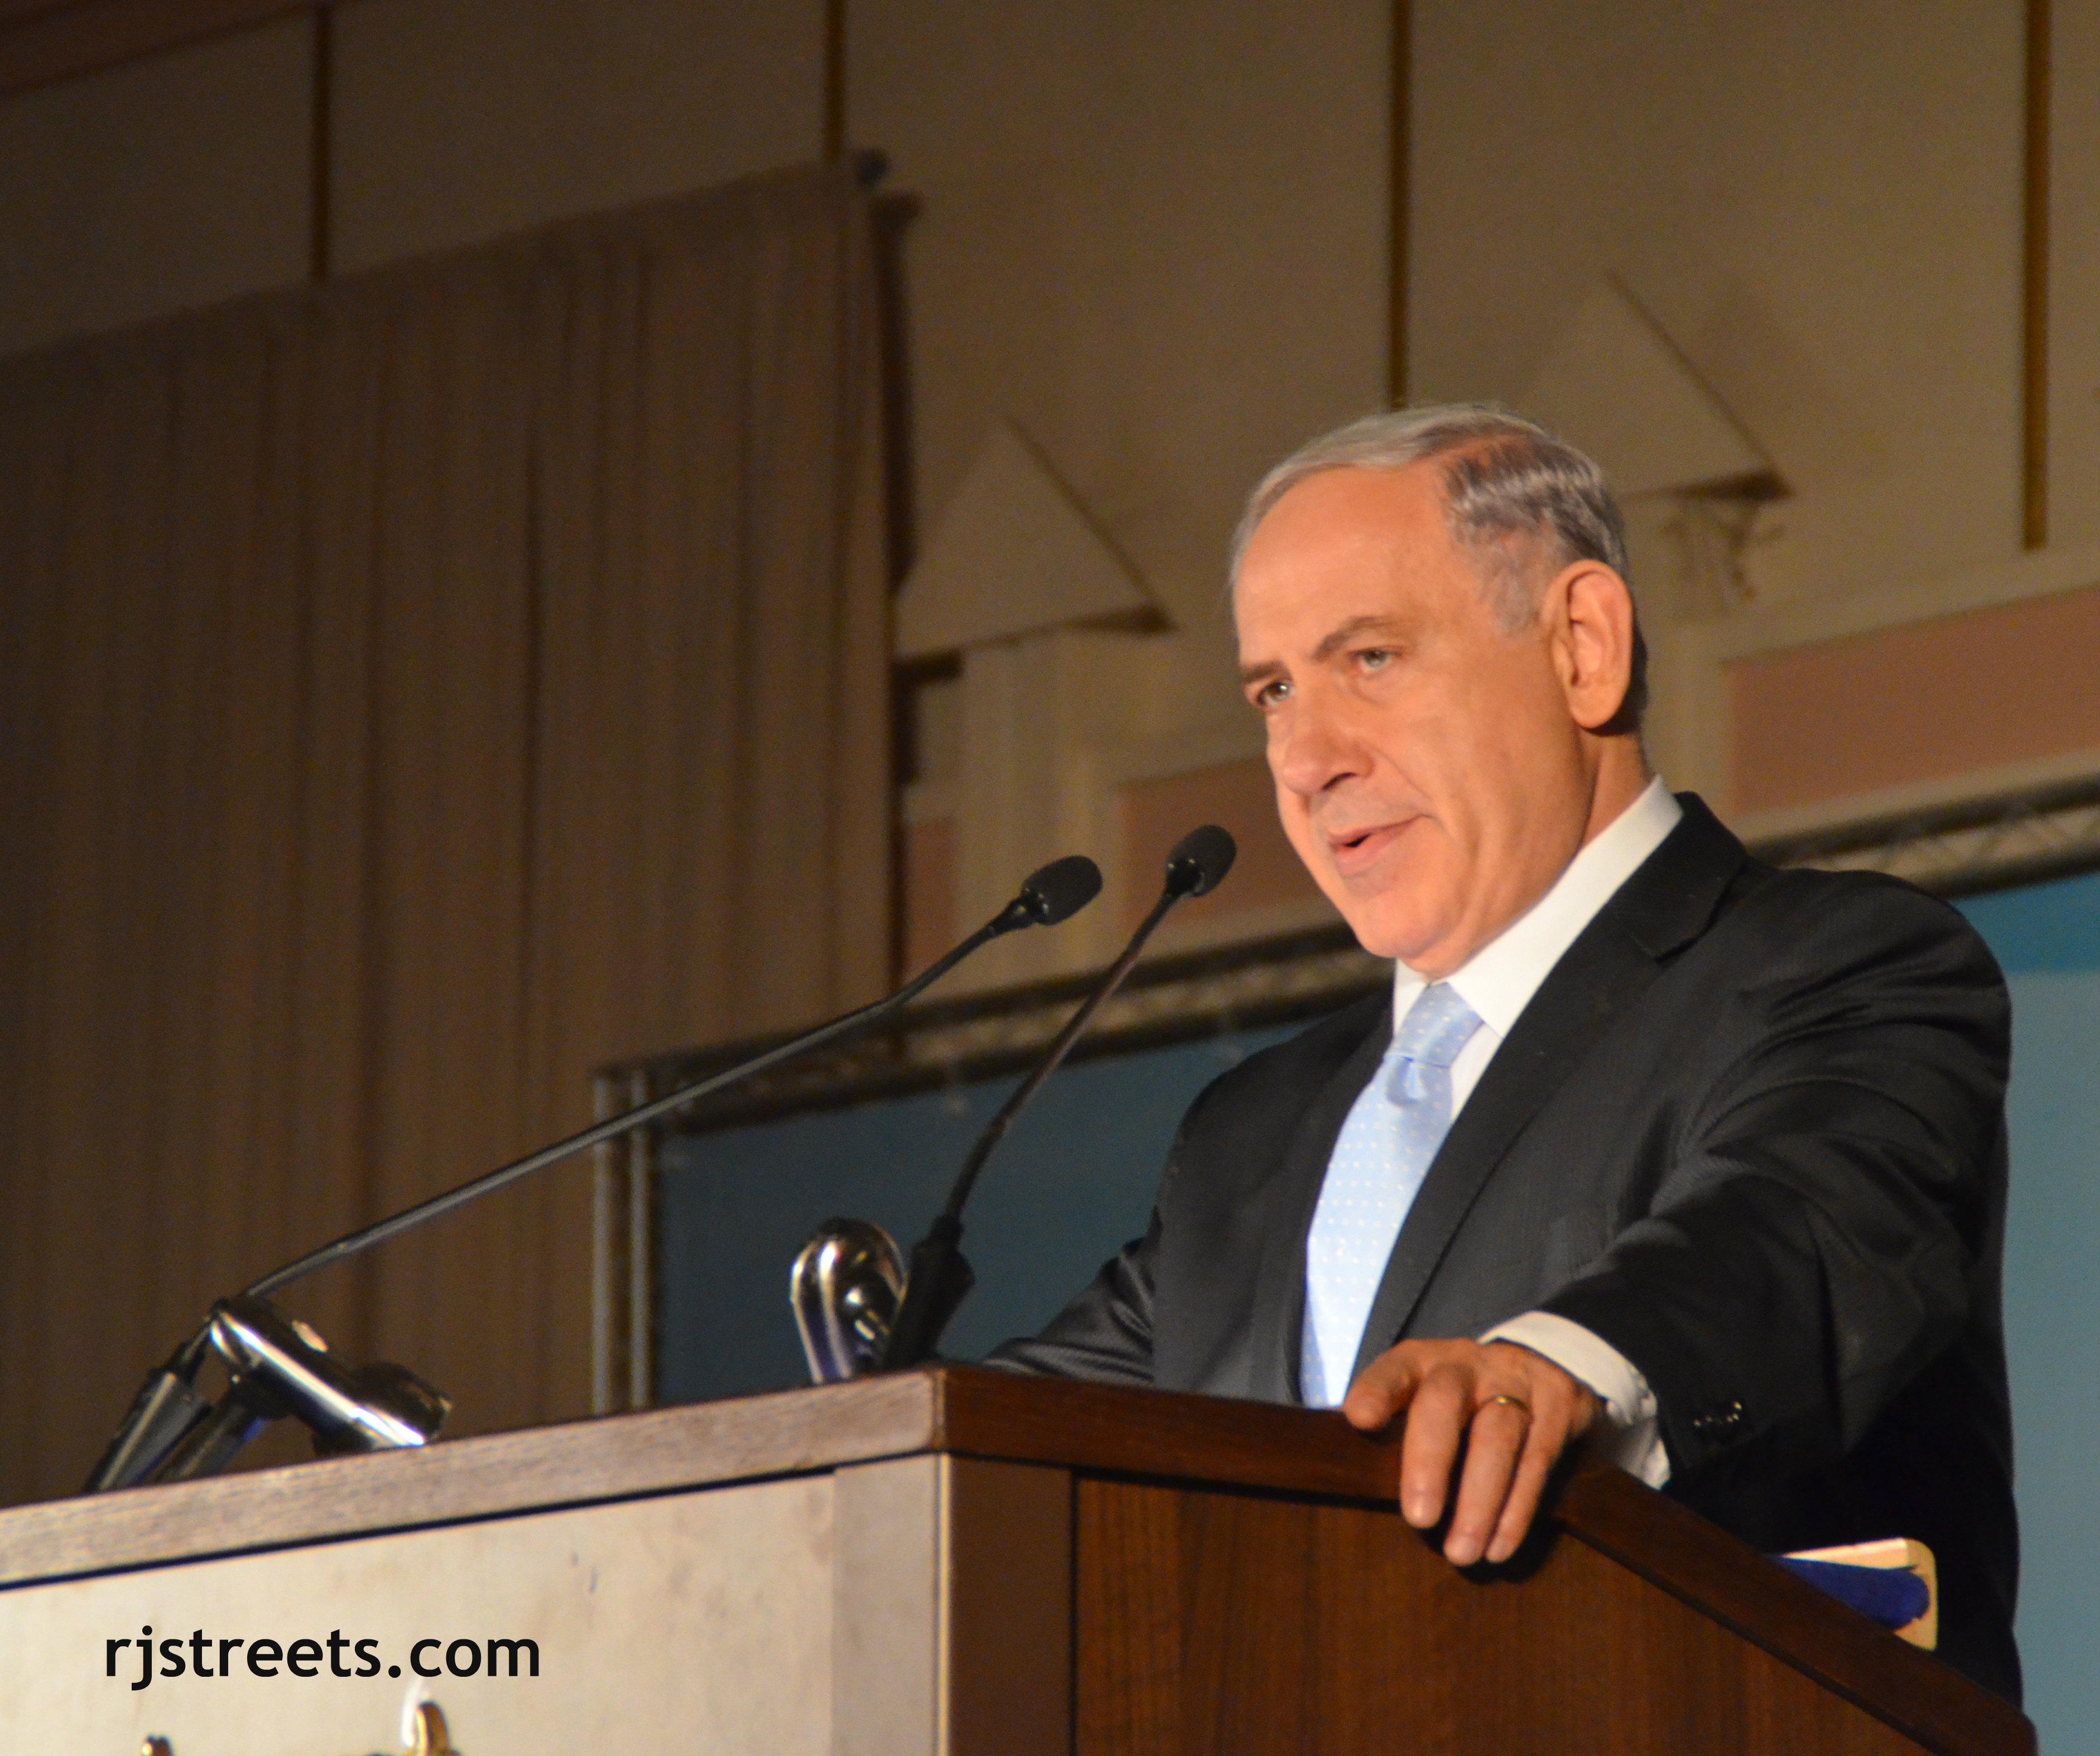 image Israeli Prime Minister